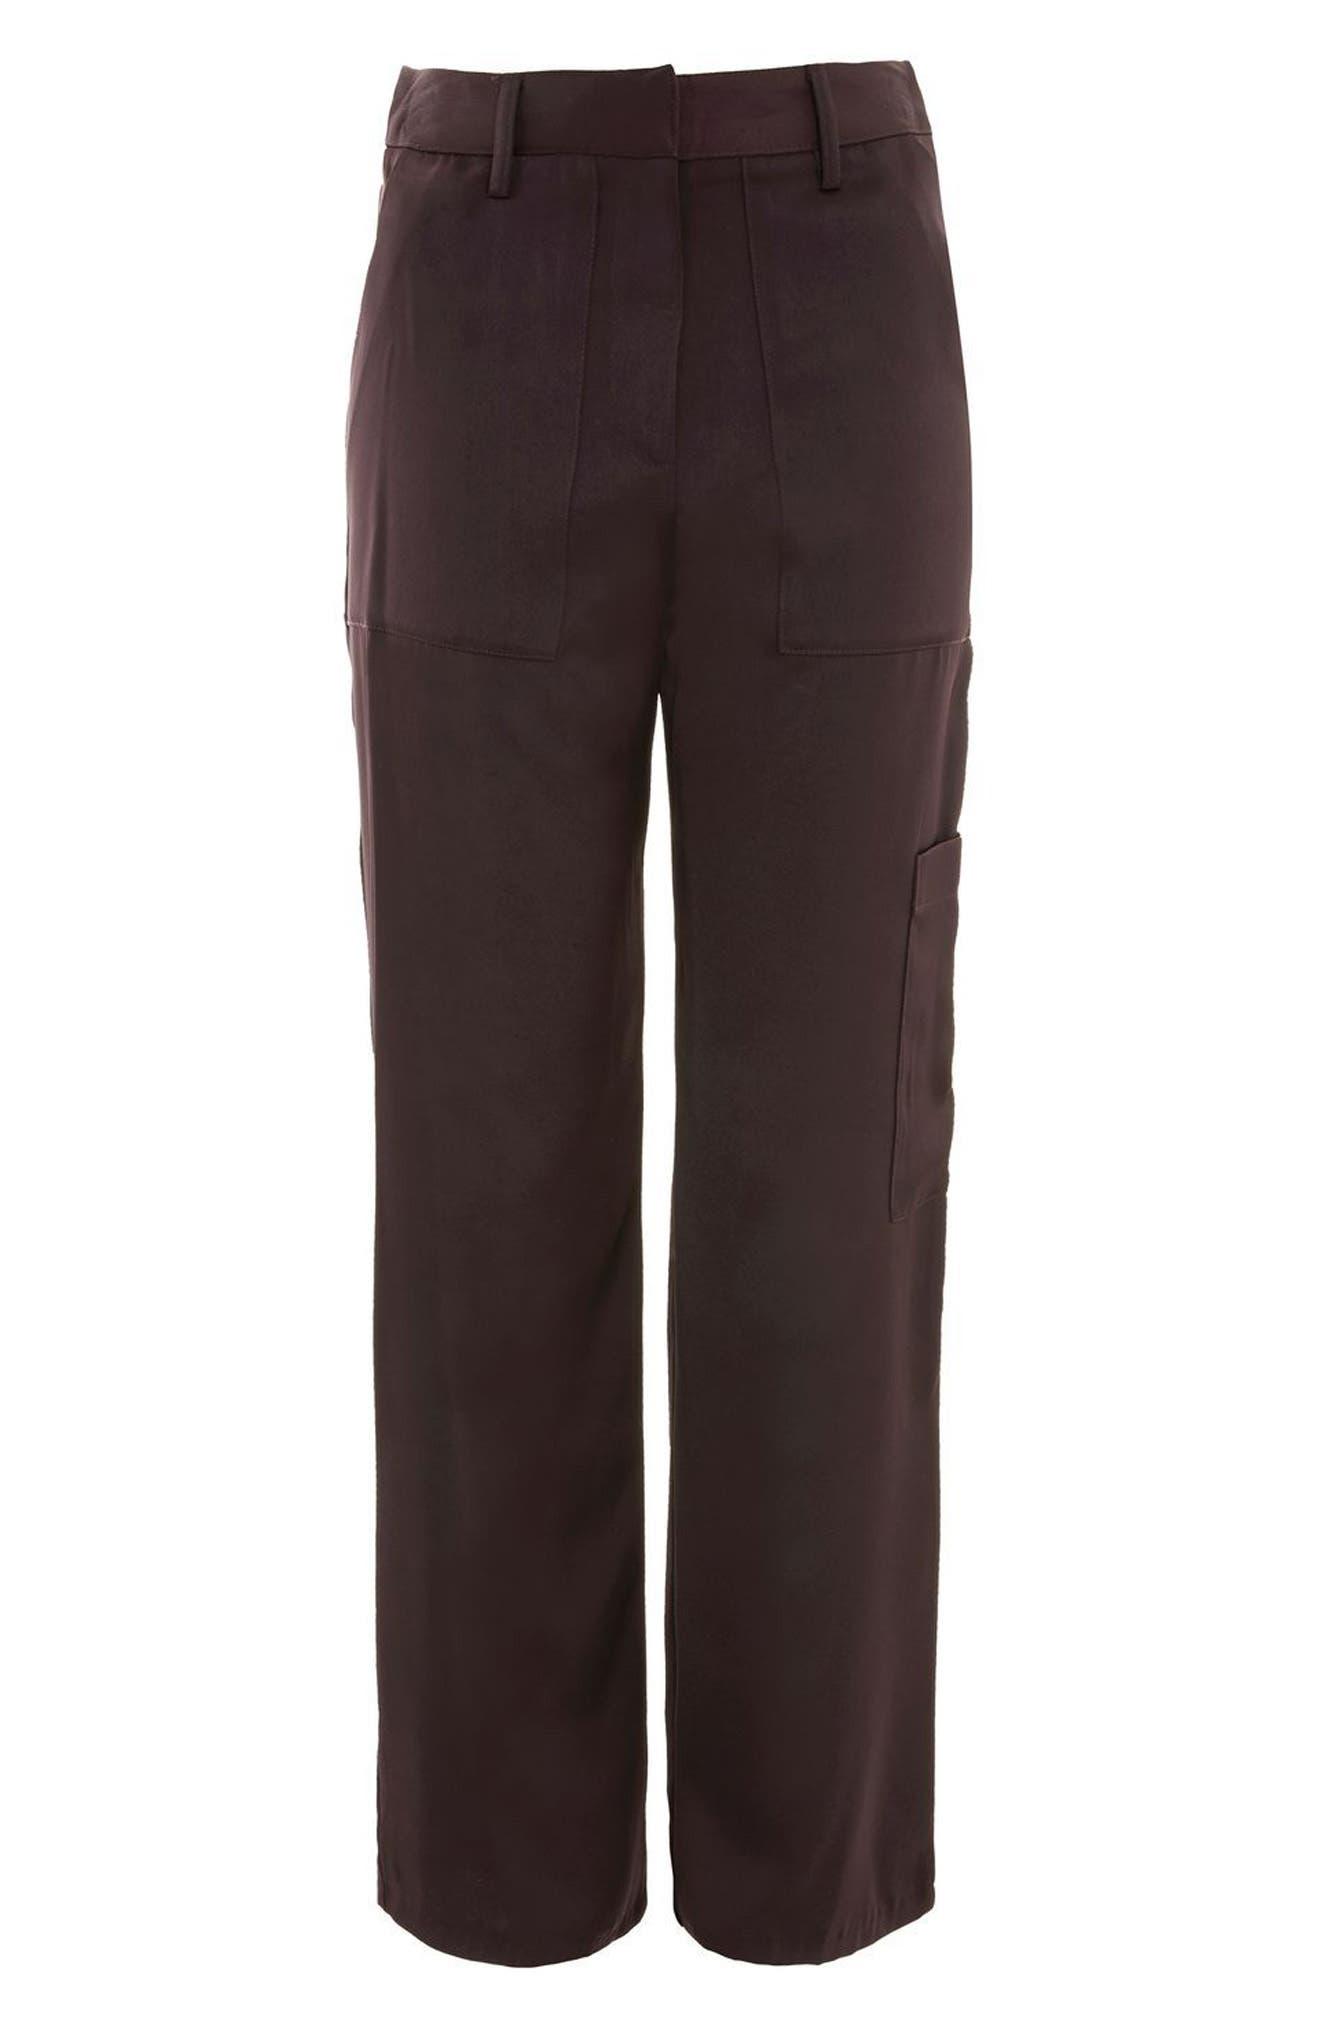 Satin Wide Leg Utility Trousers,                             Alternate thumbnail 4, color,                             Aubergine